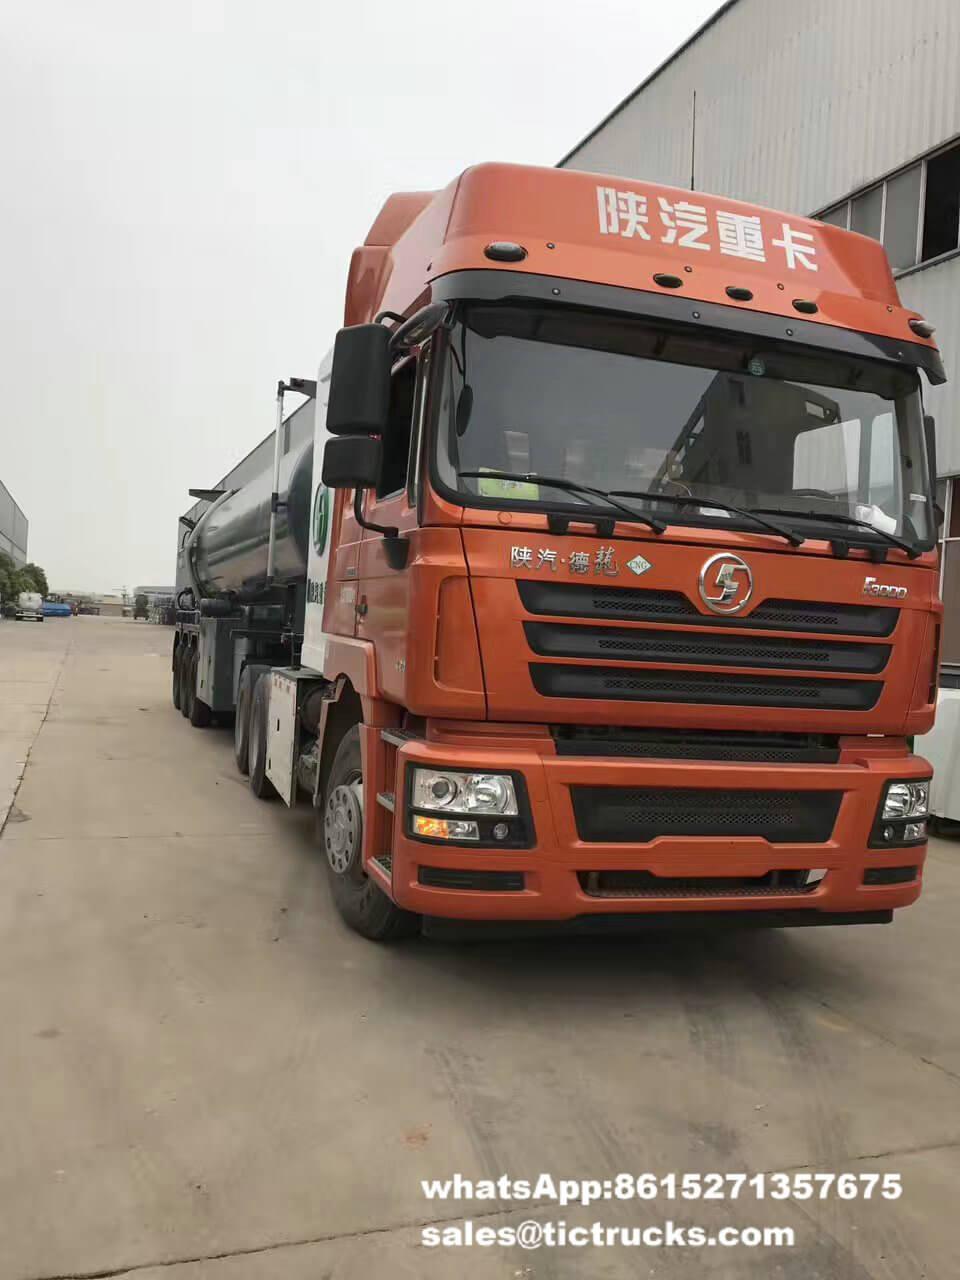 vaccum tanker-trailer-005-_1.jpg